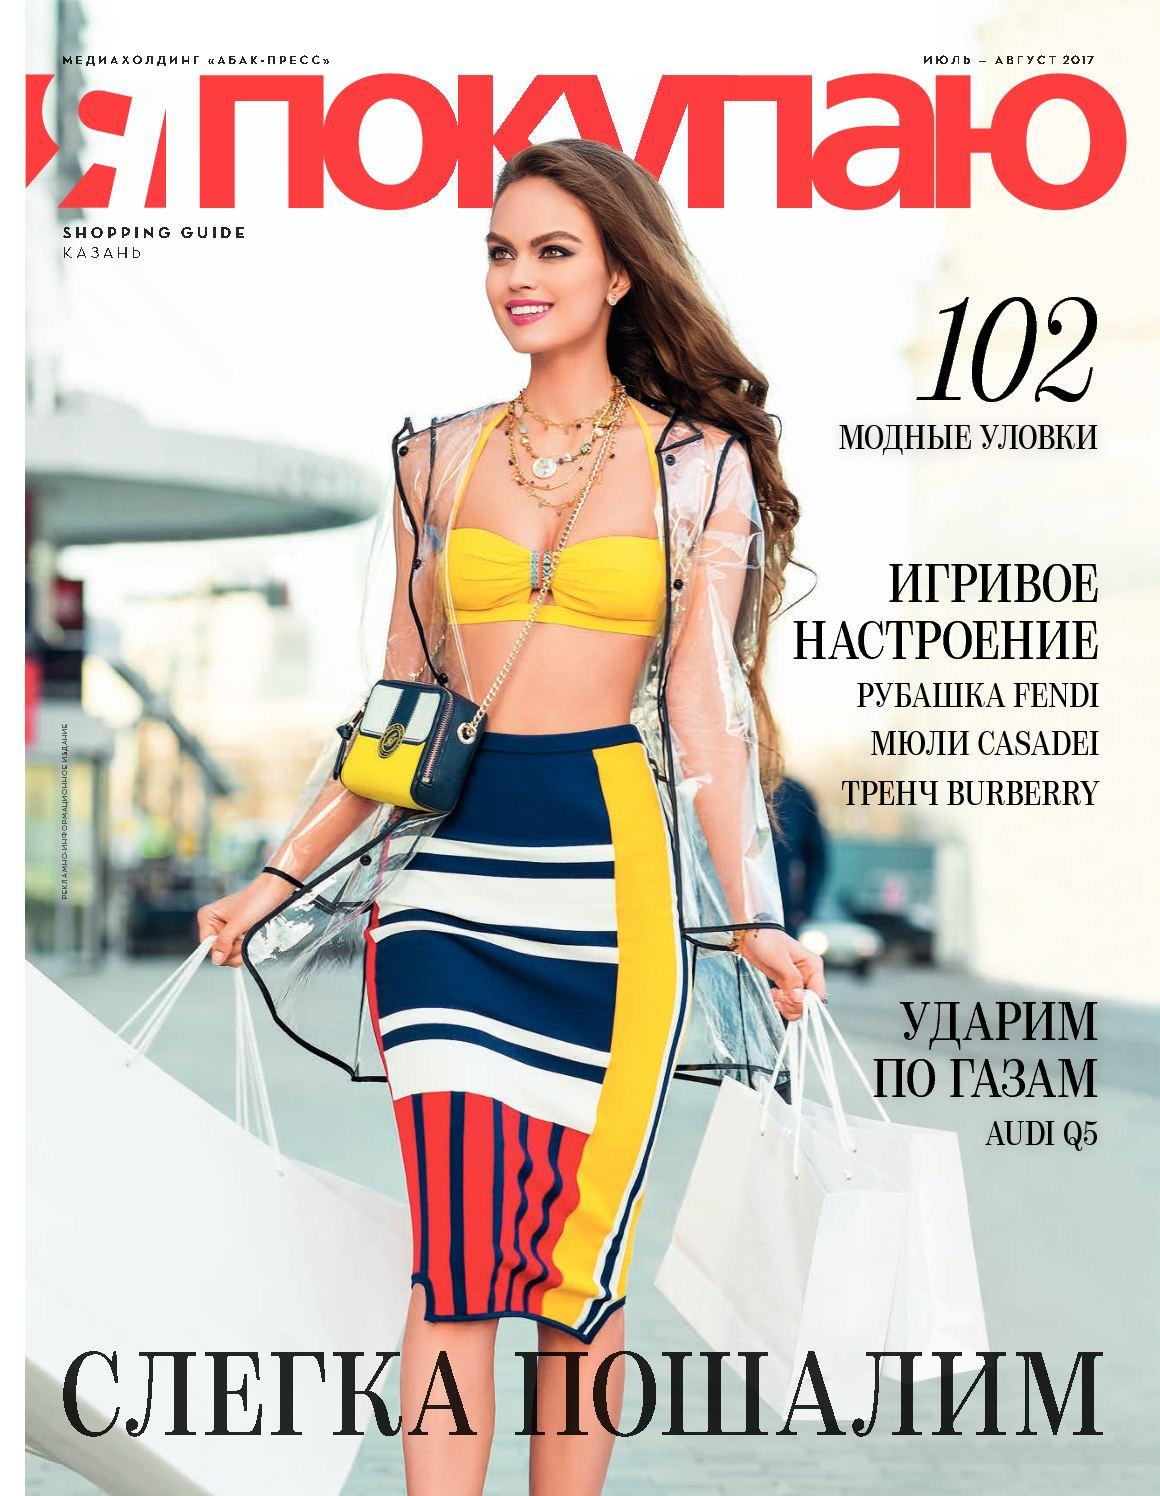 Shopping Guide «Я Покупаю. Казань», июль август 2017